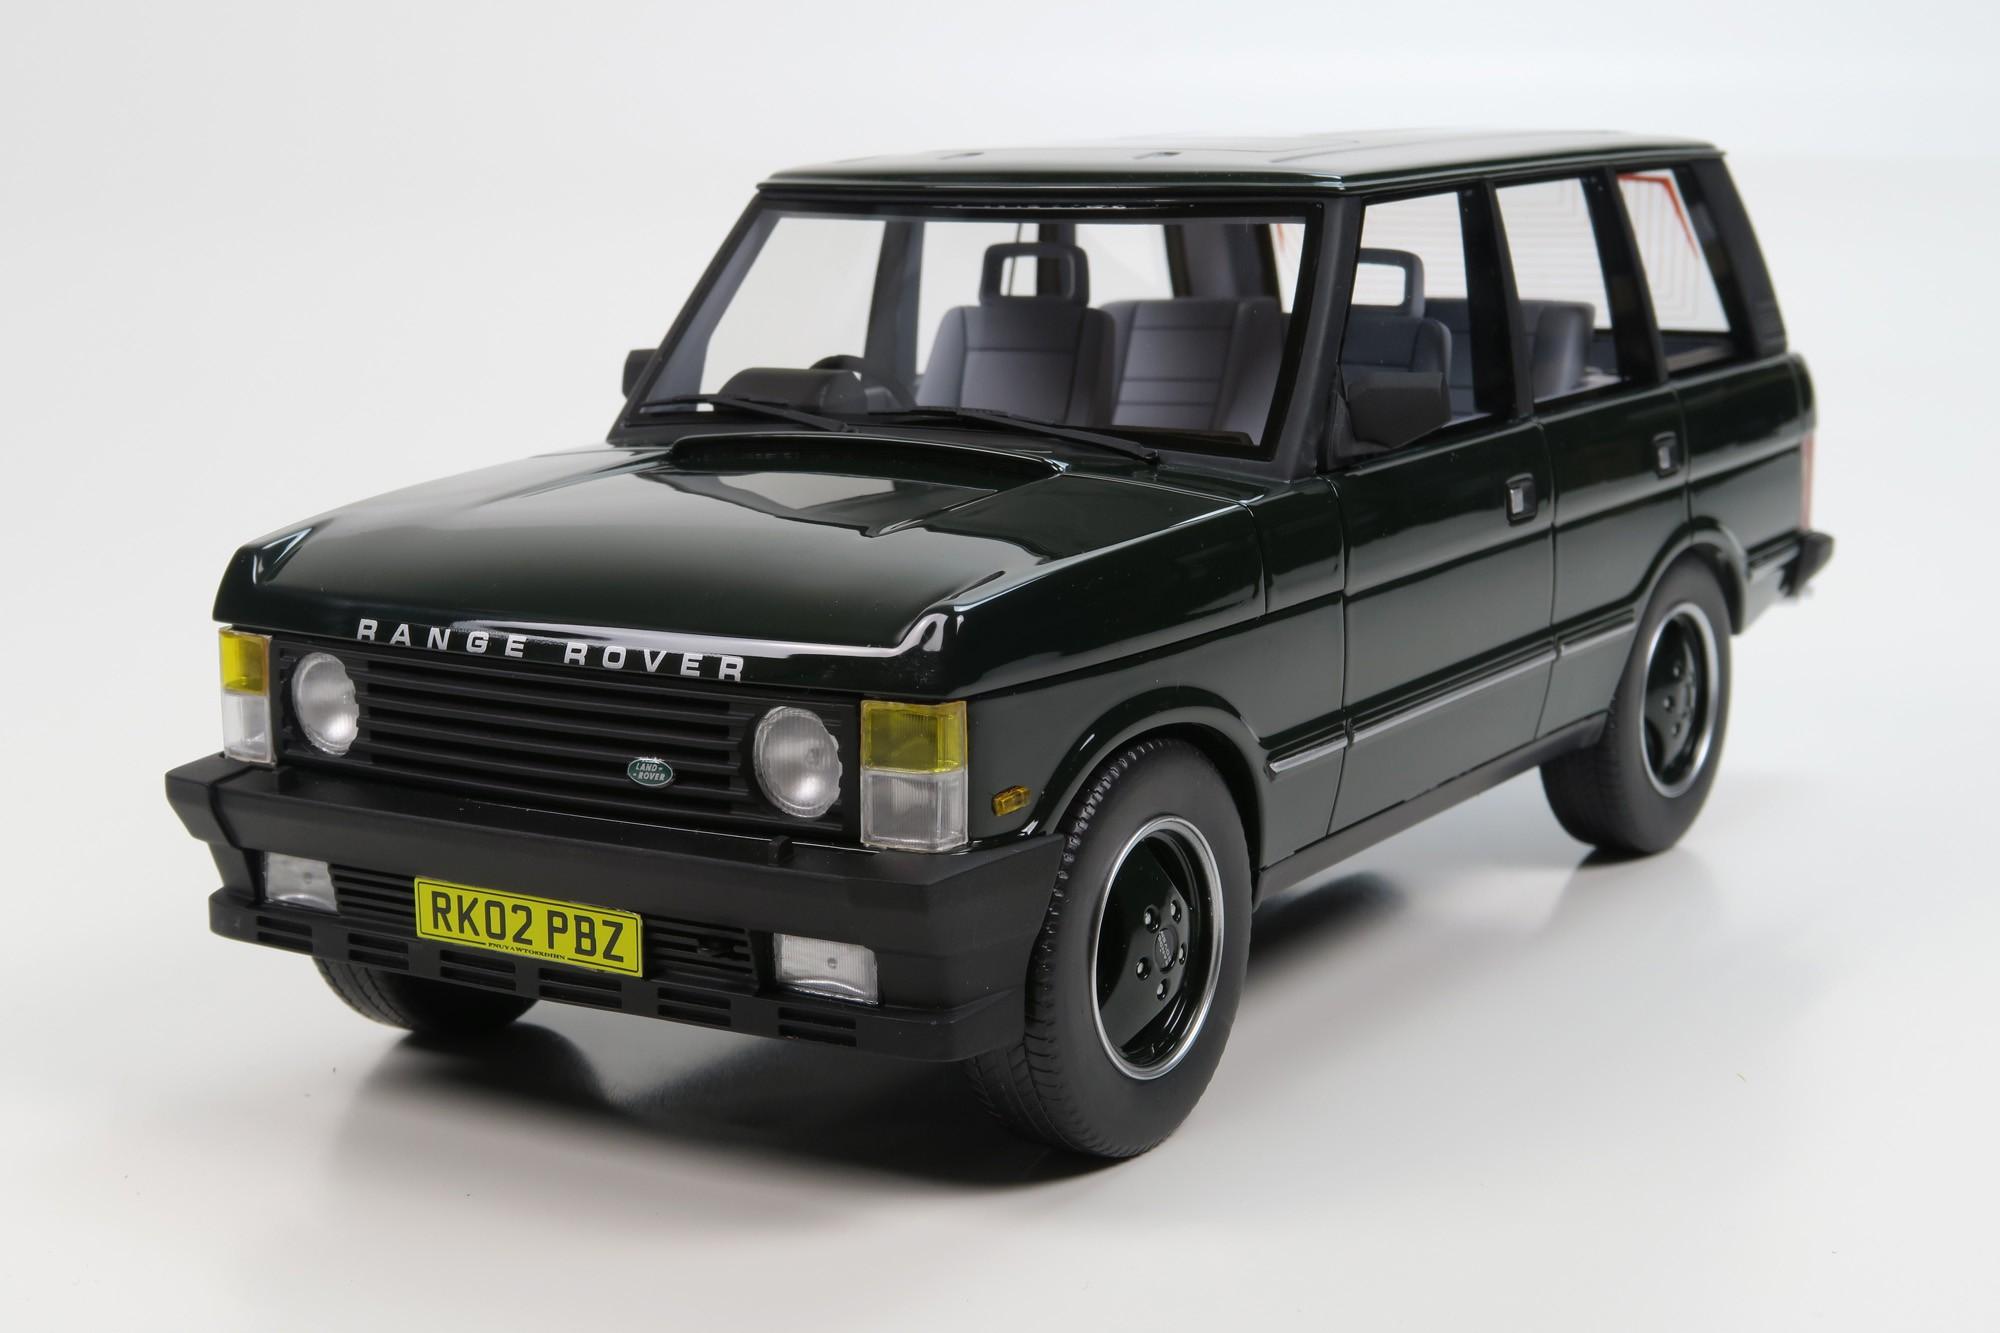 ls collectibles range rover 1 18 green ls001a. Black Bedroom Furniture Sets. Home Design Ideas